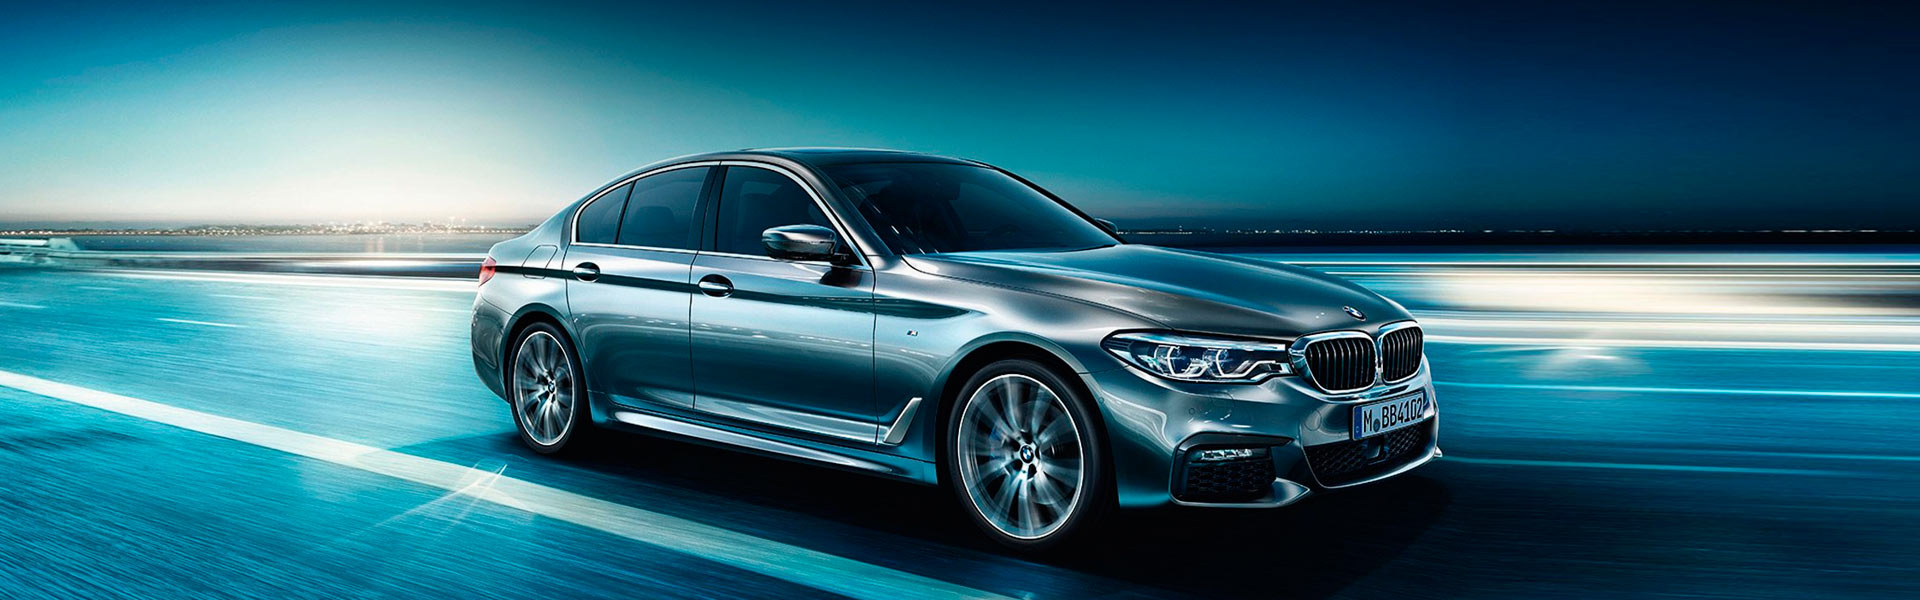 Замена масла в редукторе BMW 5-series